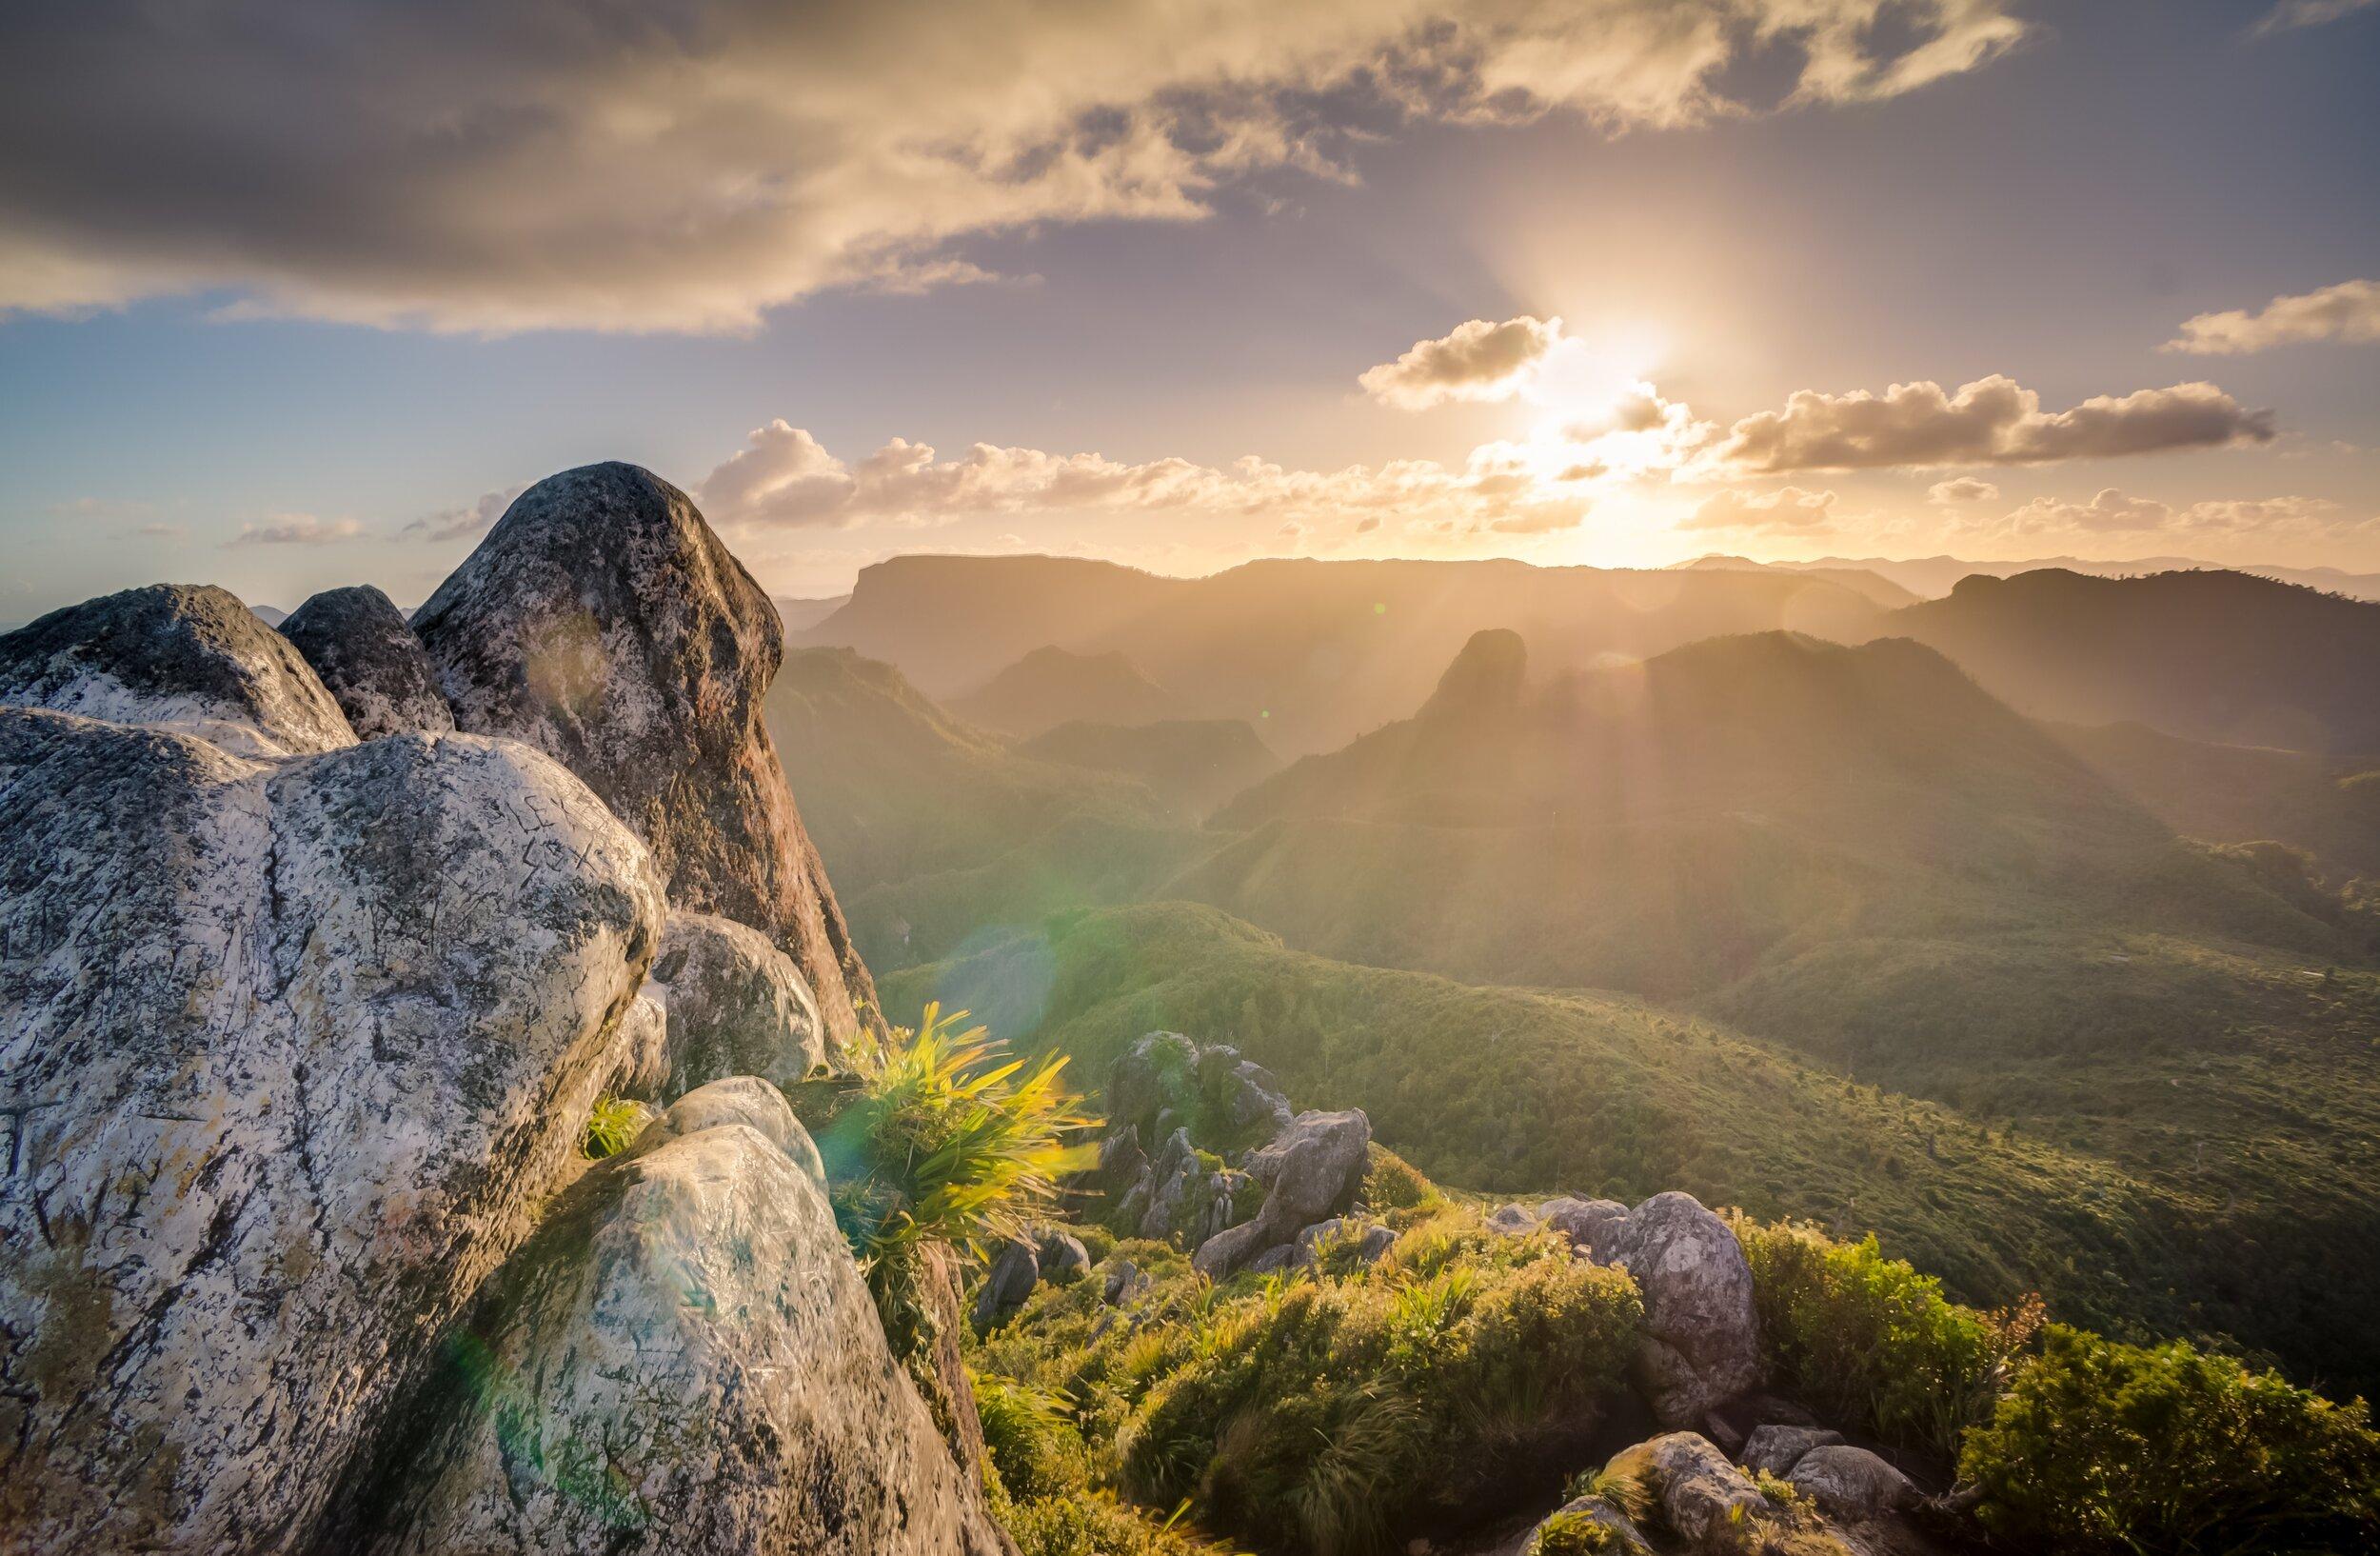 medicinal-mindfulness-ecology-psychedelics-ecopsychedelics-nonprofit-cannabis.jpg